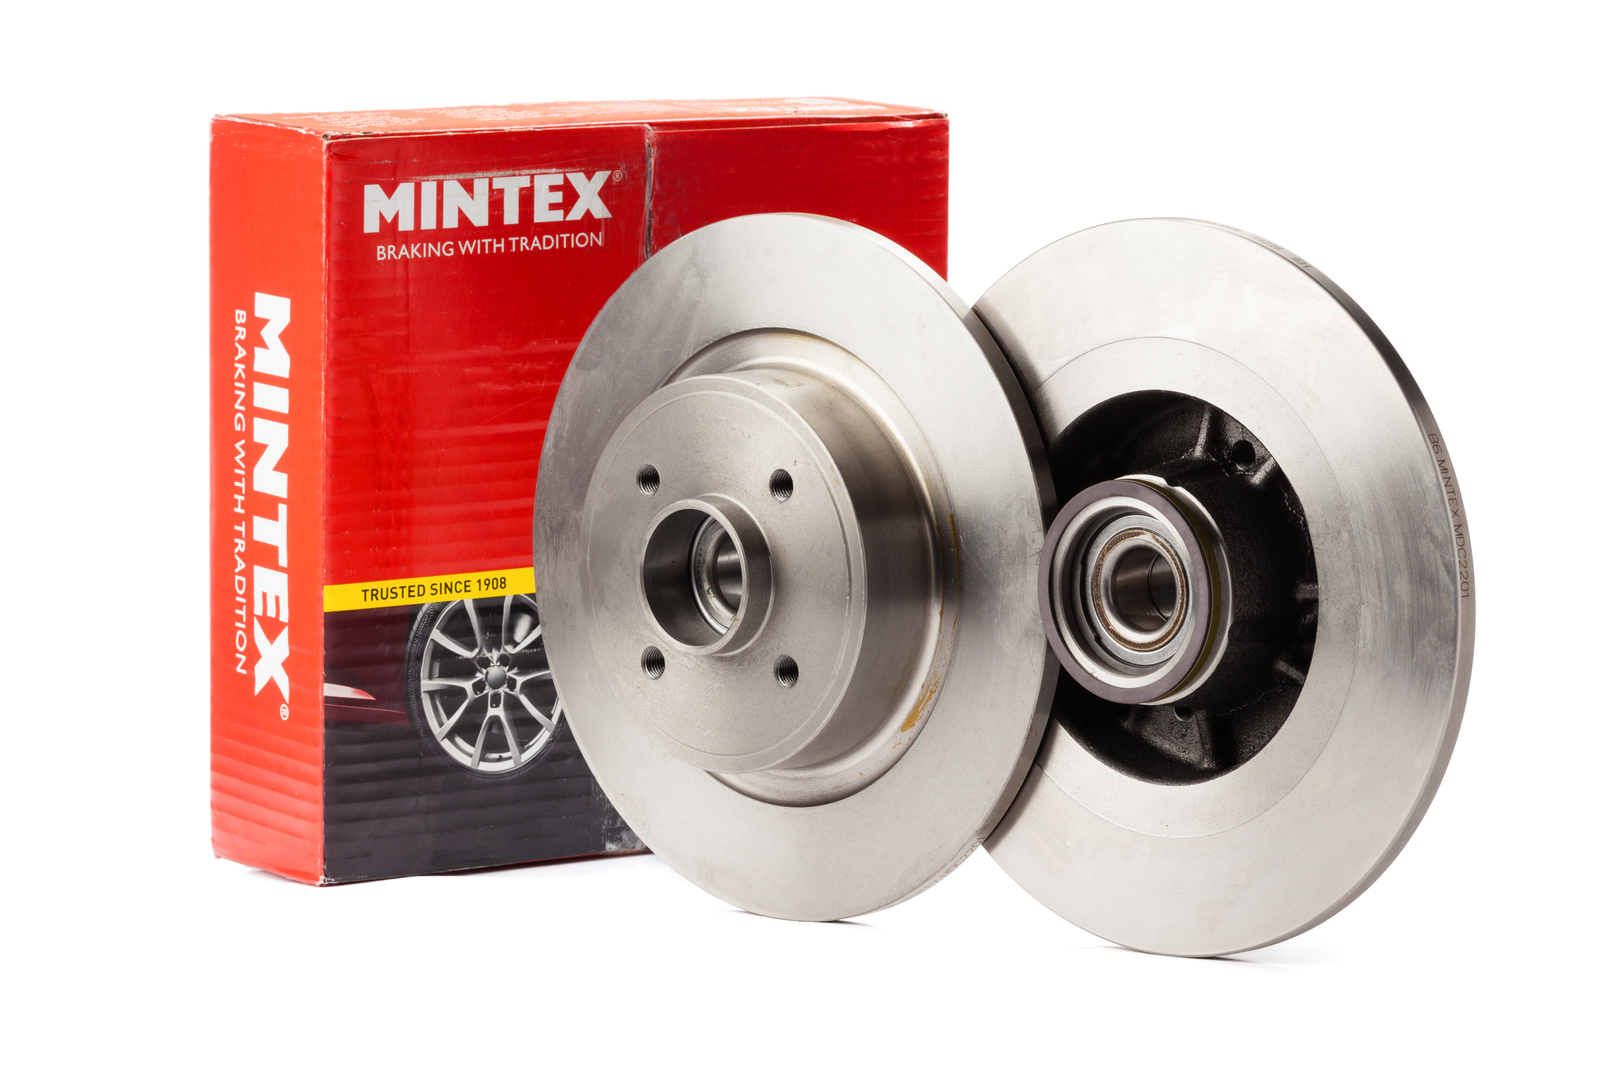 Bosch 0 986 478 979 Brake Disc Single